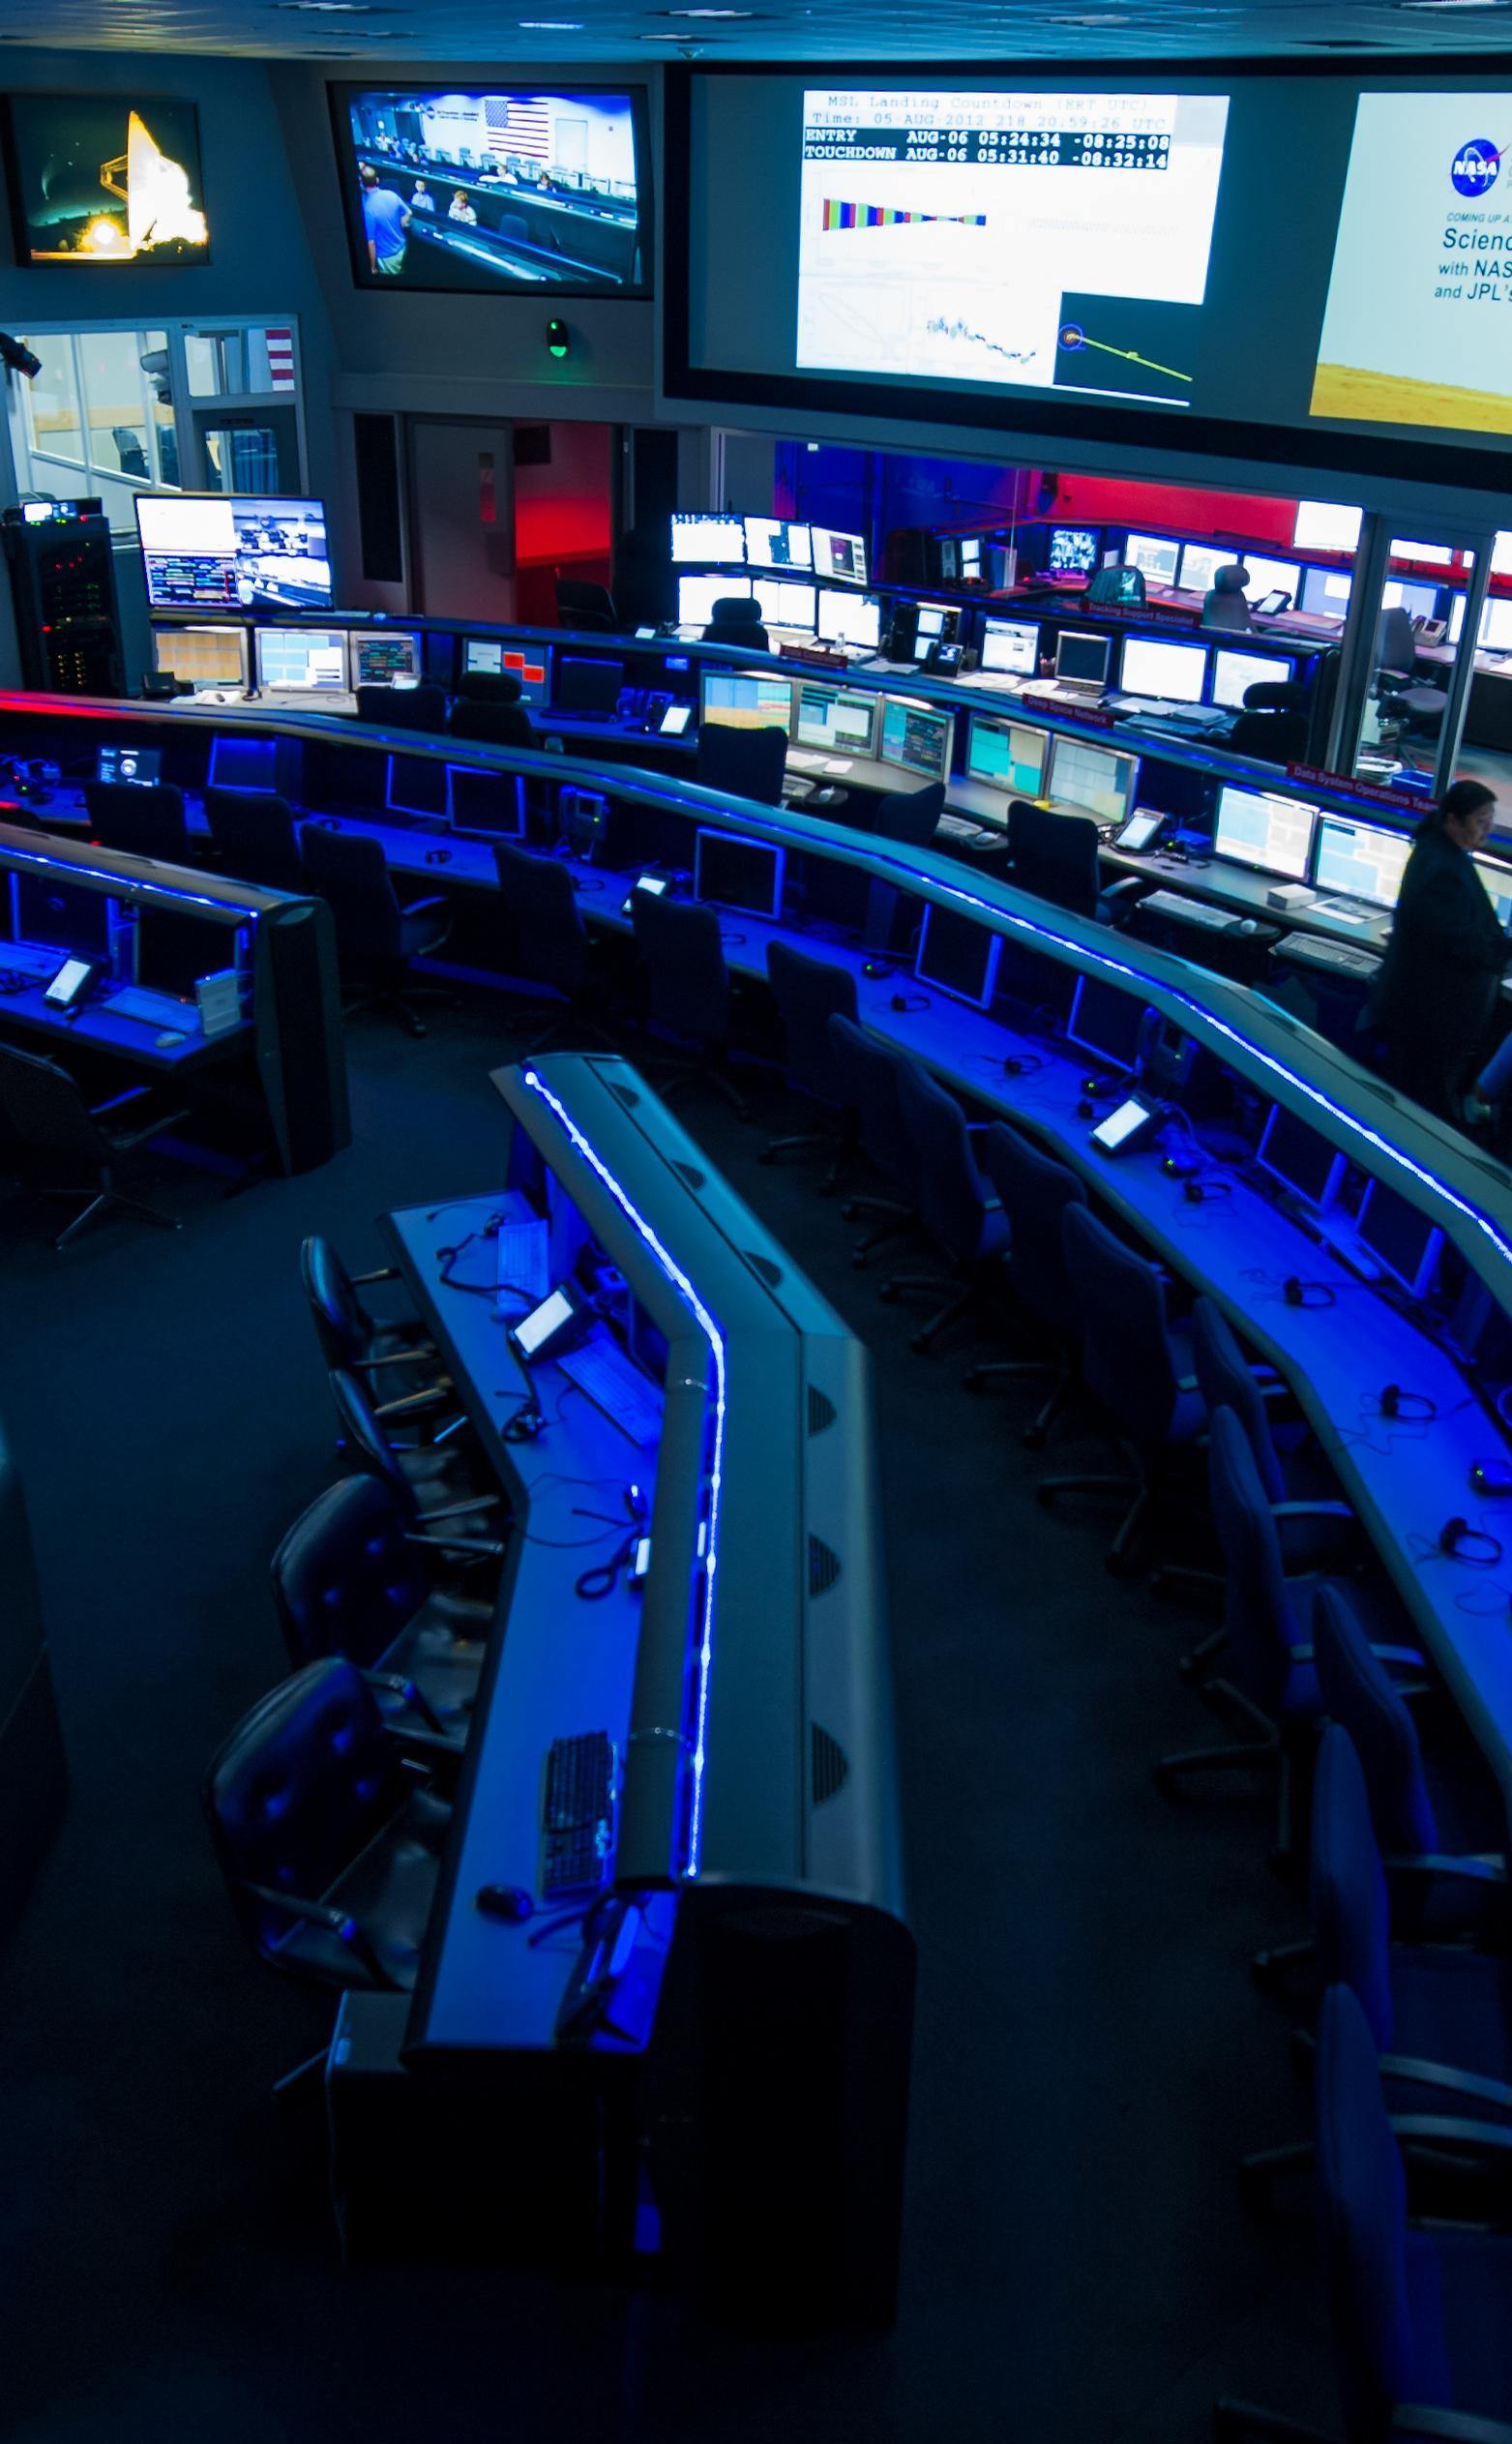 mars rover control room - photo #8